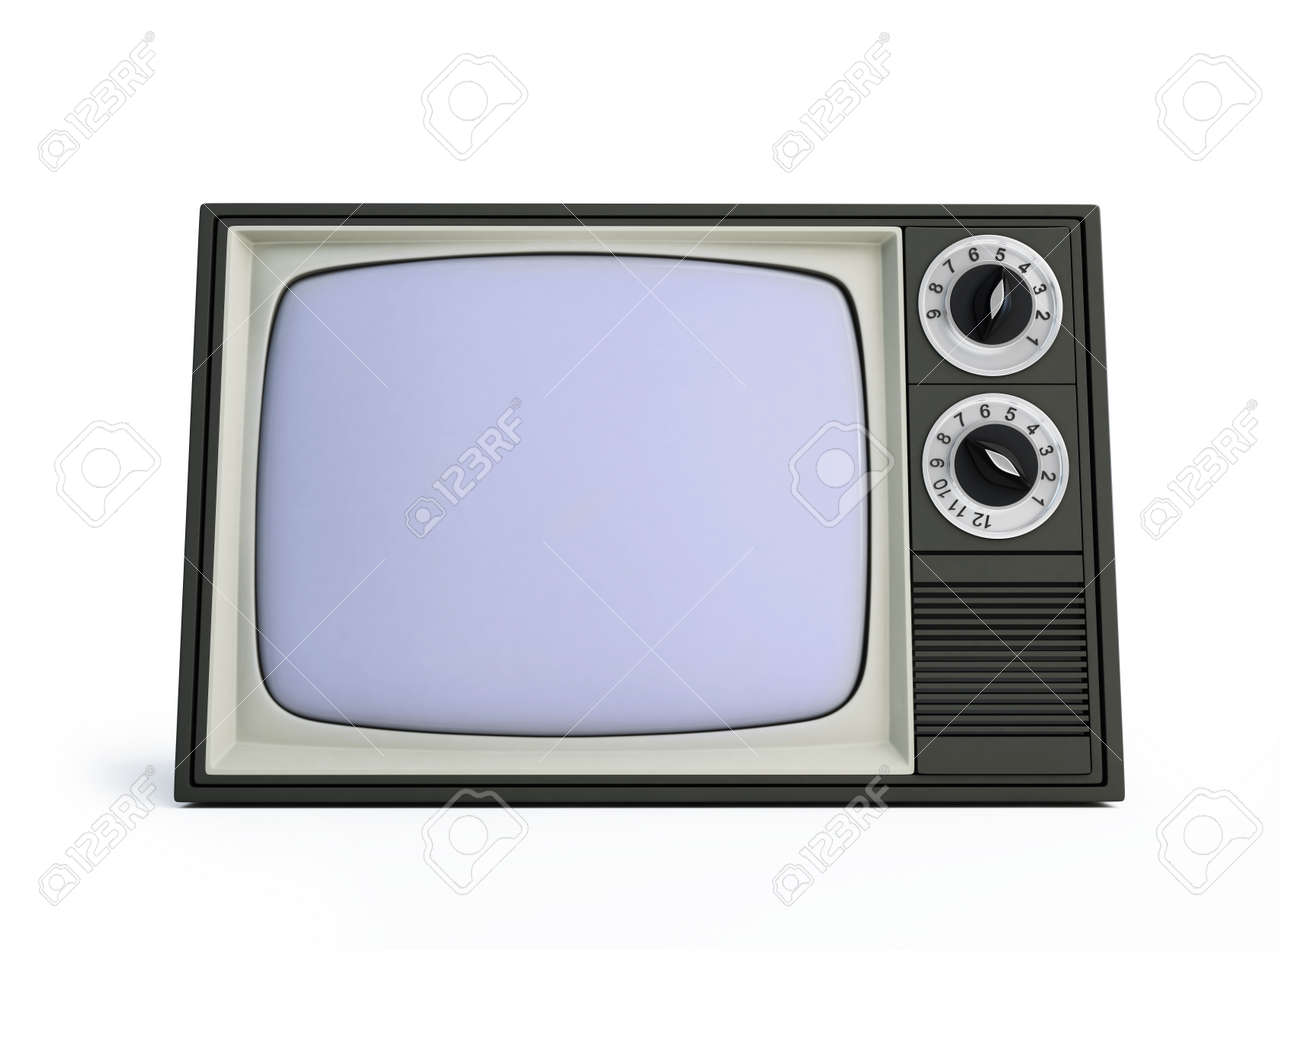 old televisor isolated on a white background Stock Photo - 7685847